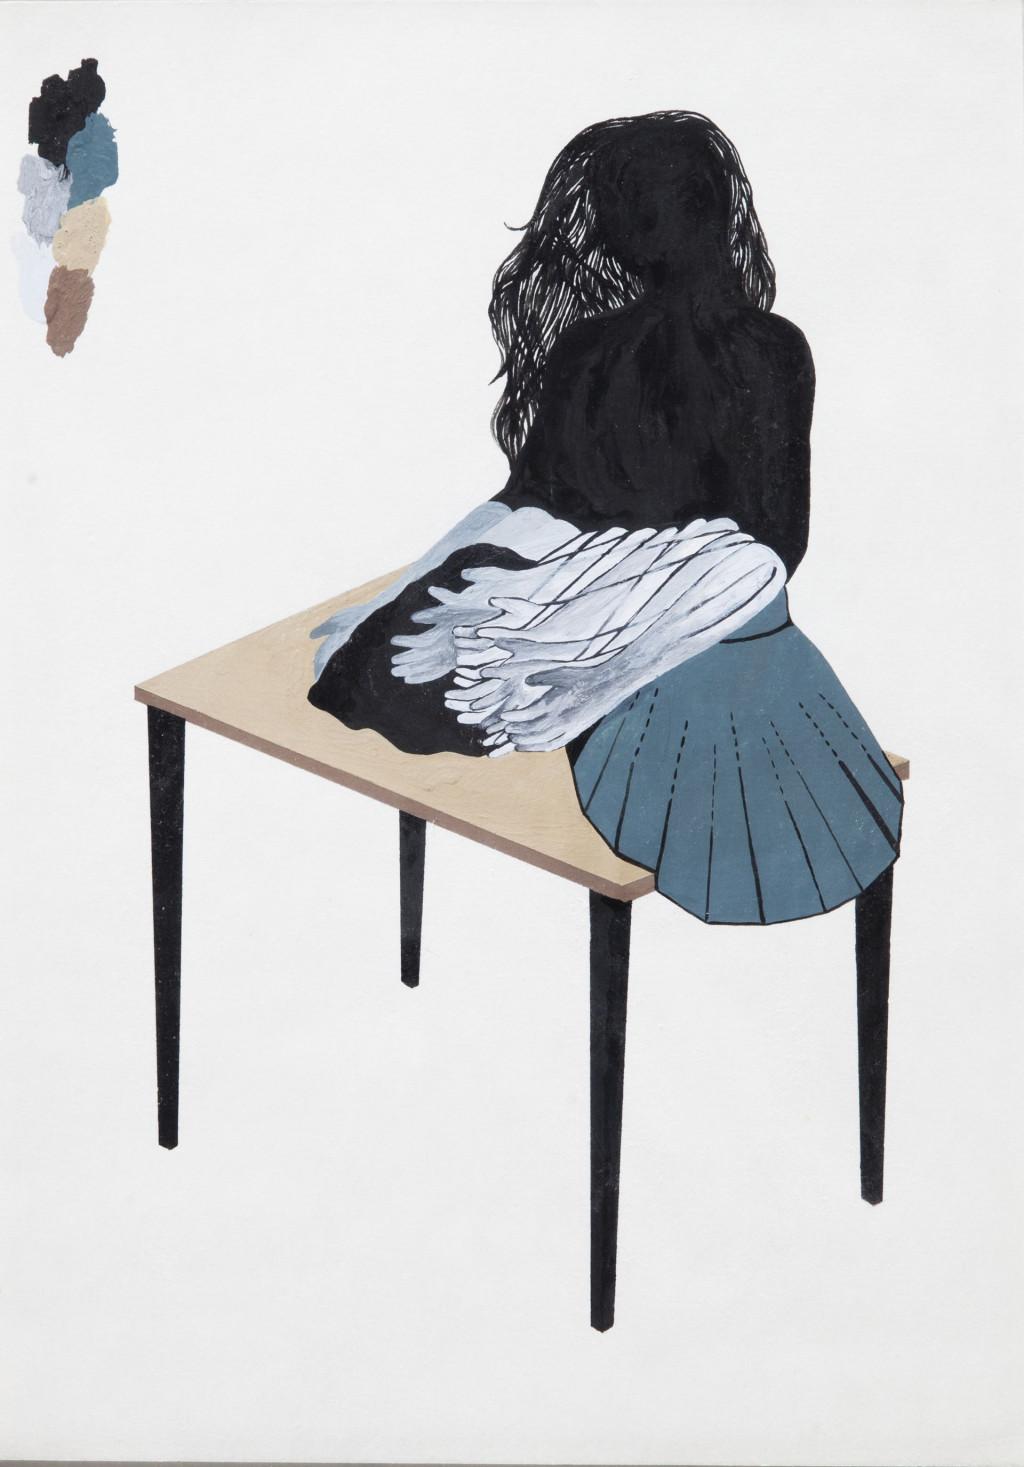 Otobong Nkanga, 'Caress', 2010. Collection Stedelijk Museum Amsterdam